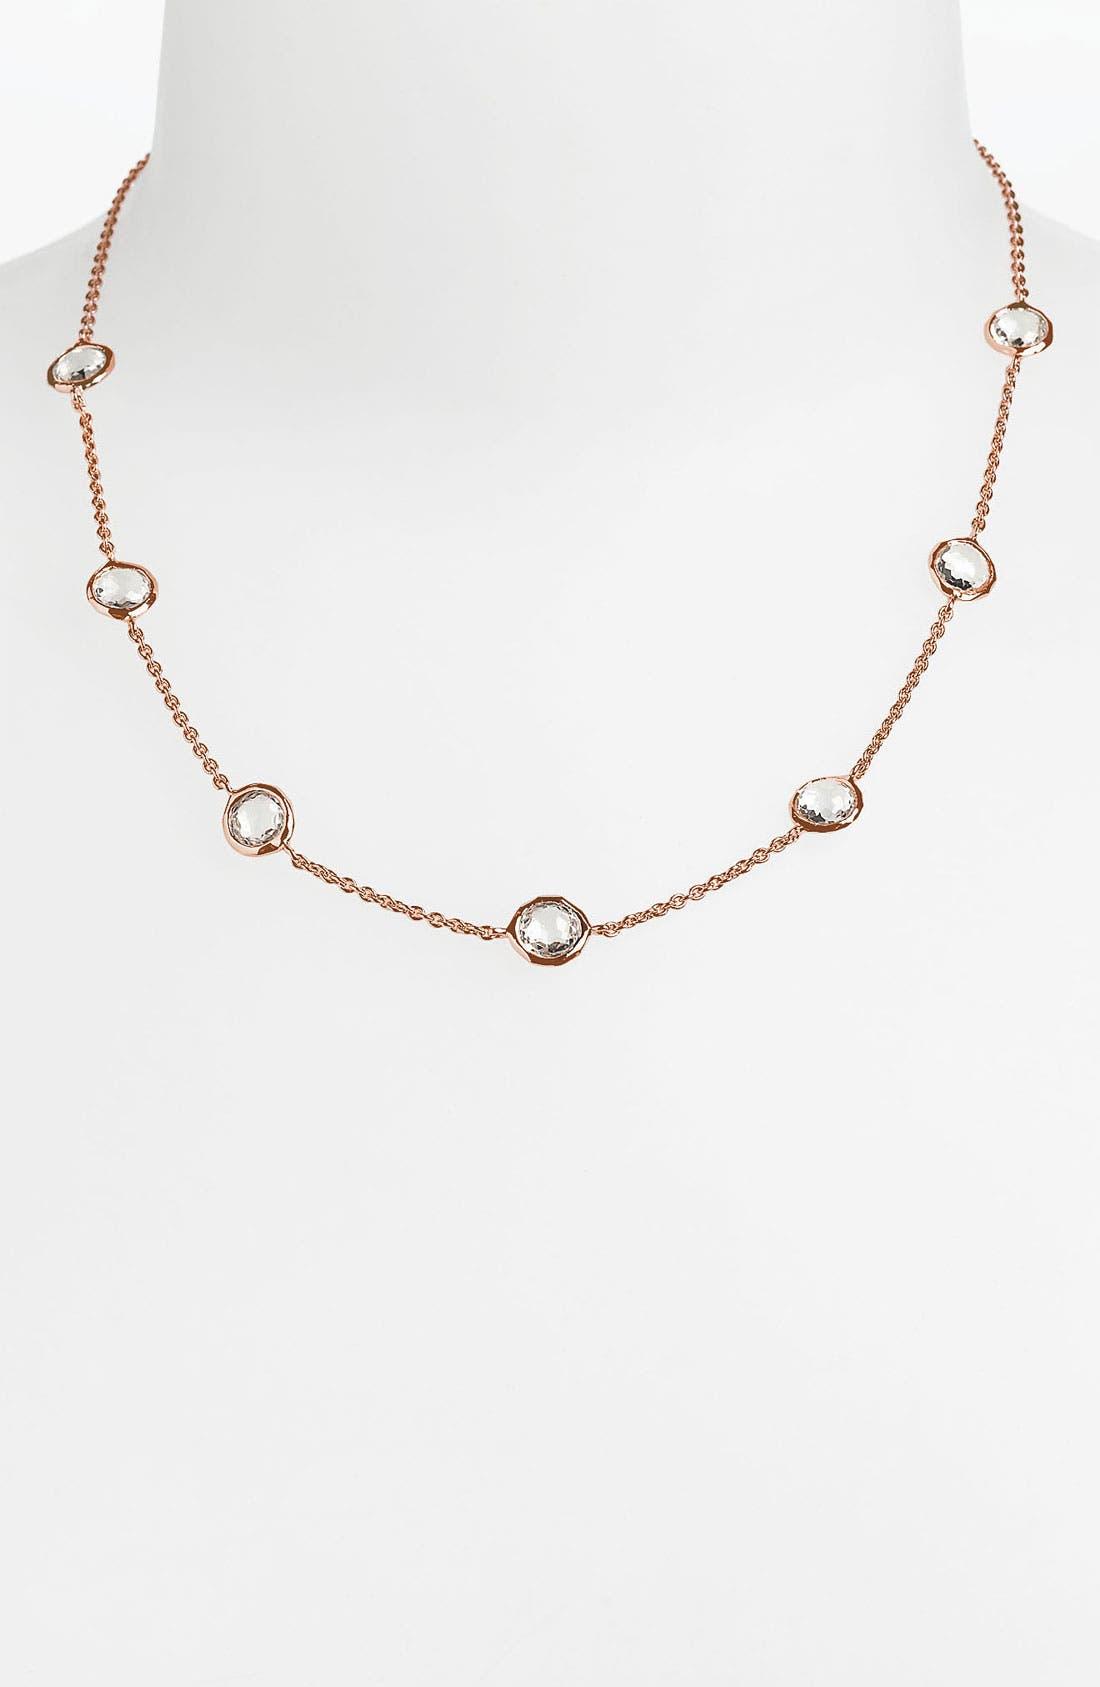 Main Image - Ippolita 'Rock Candy' 7-Station Lollipop Rosé Necklace